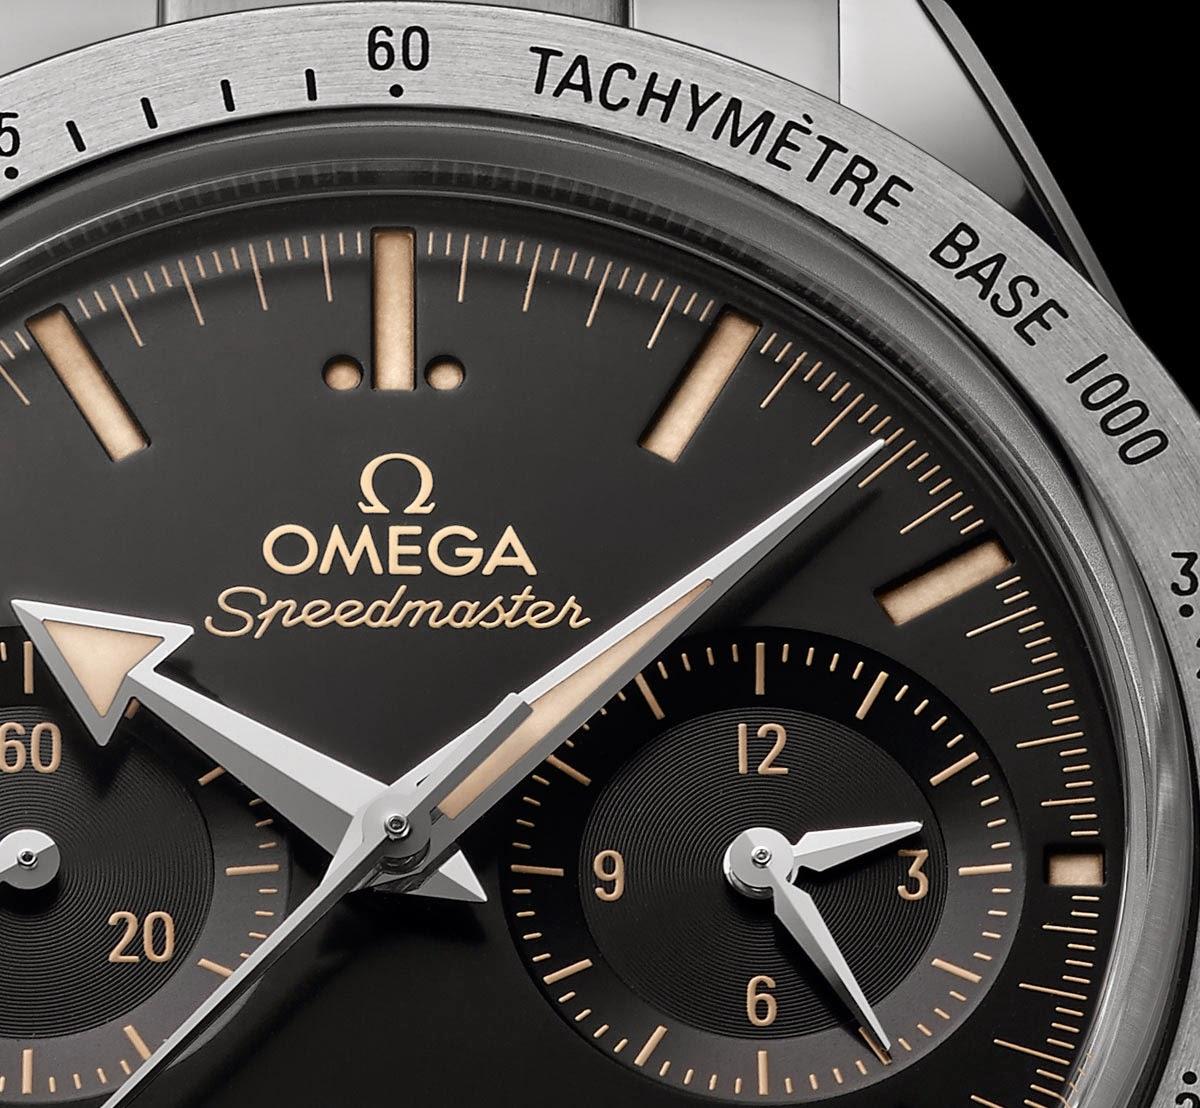 omega - Omega Speedmaster 57 - Edition 2015 Omega_Speedmaster57_2015-Edition_dialdetail_331.10.42.51.01